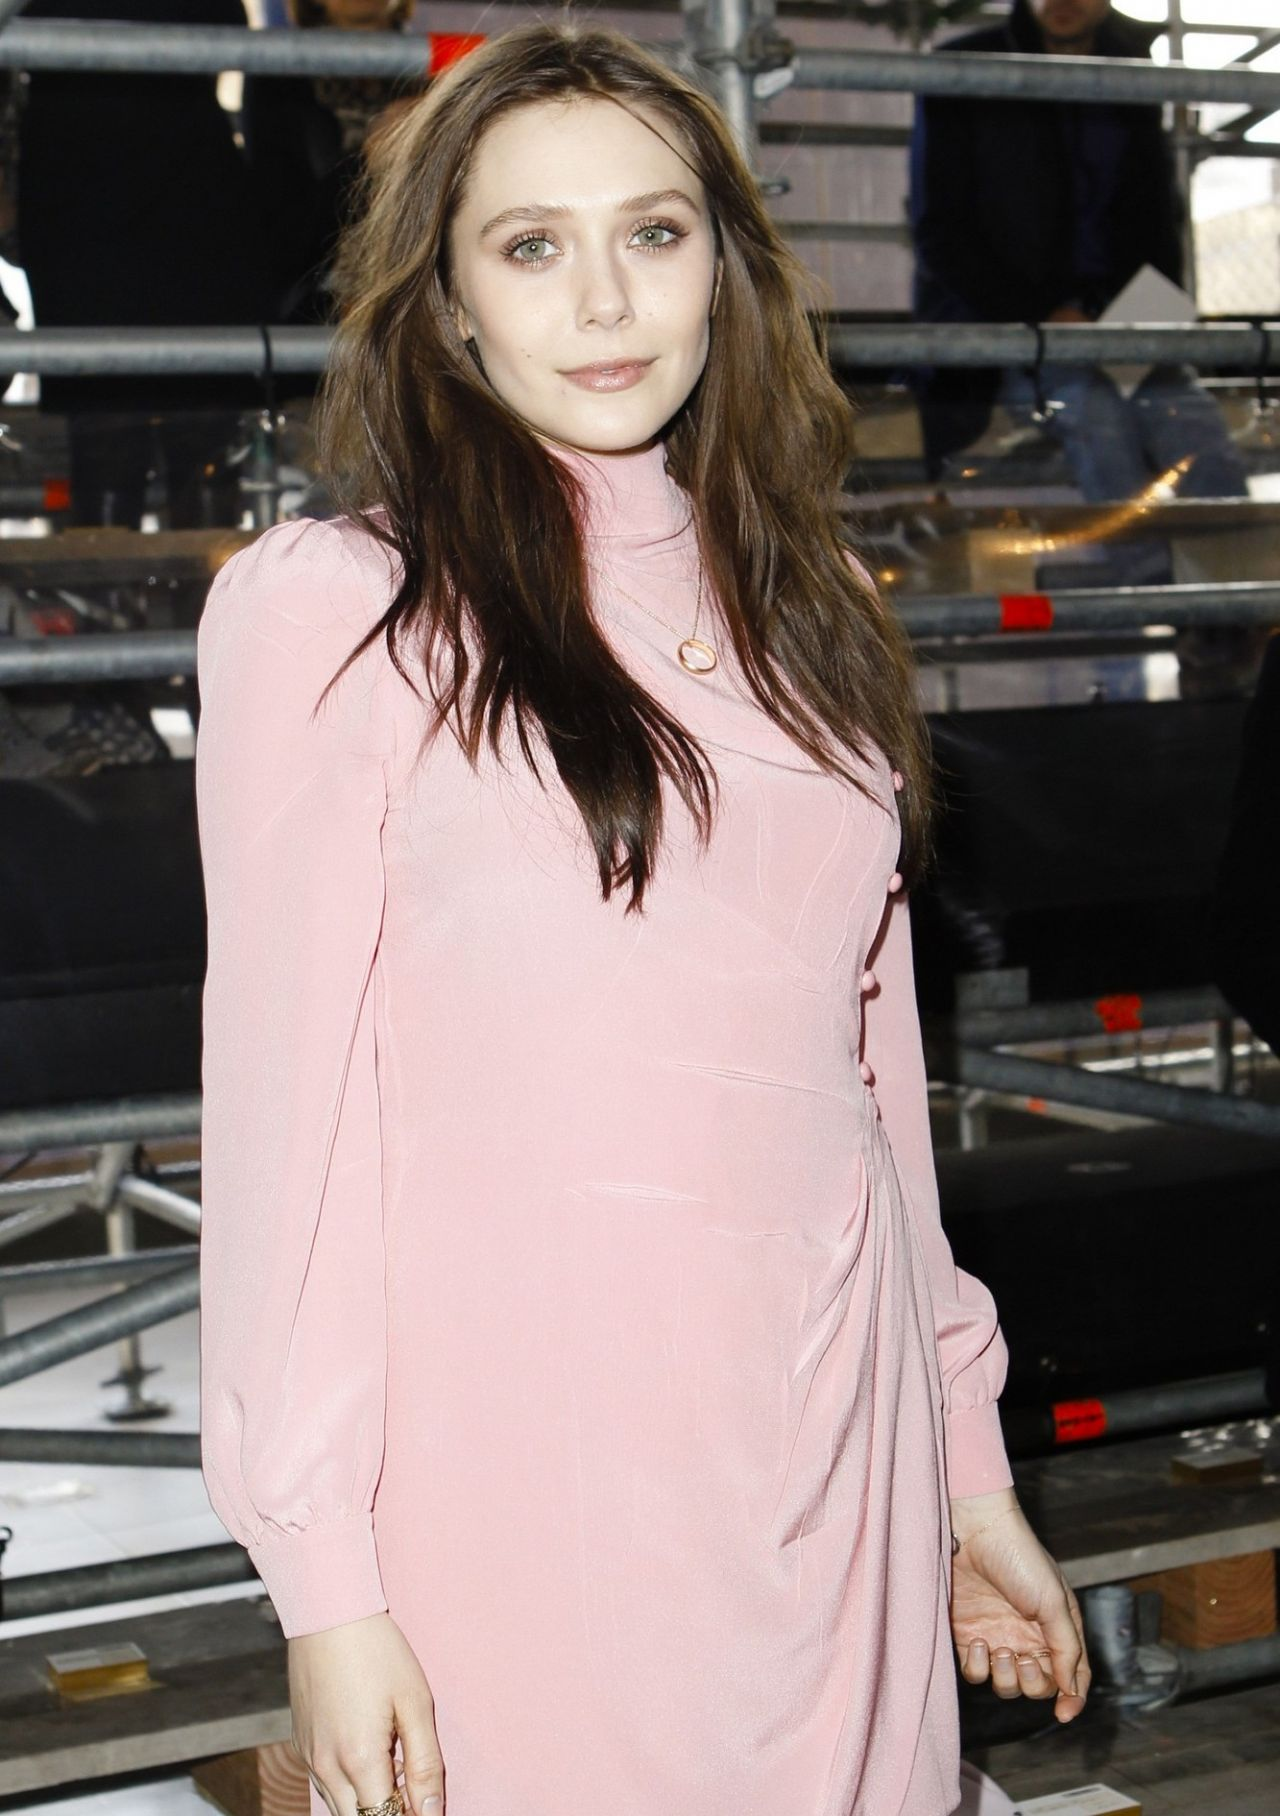 Elizabeth Olsen In Paris Miu Miu Fashion Show March 2014